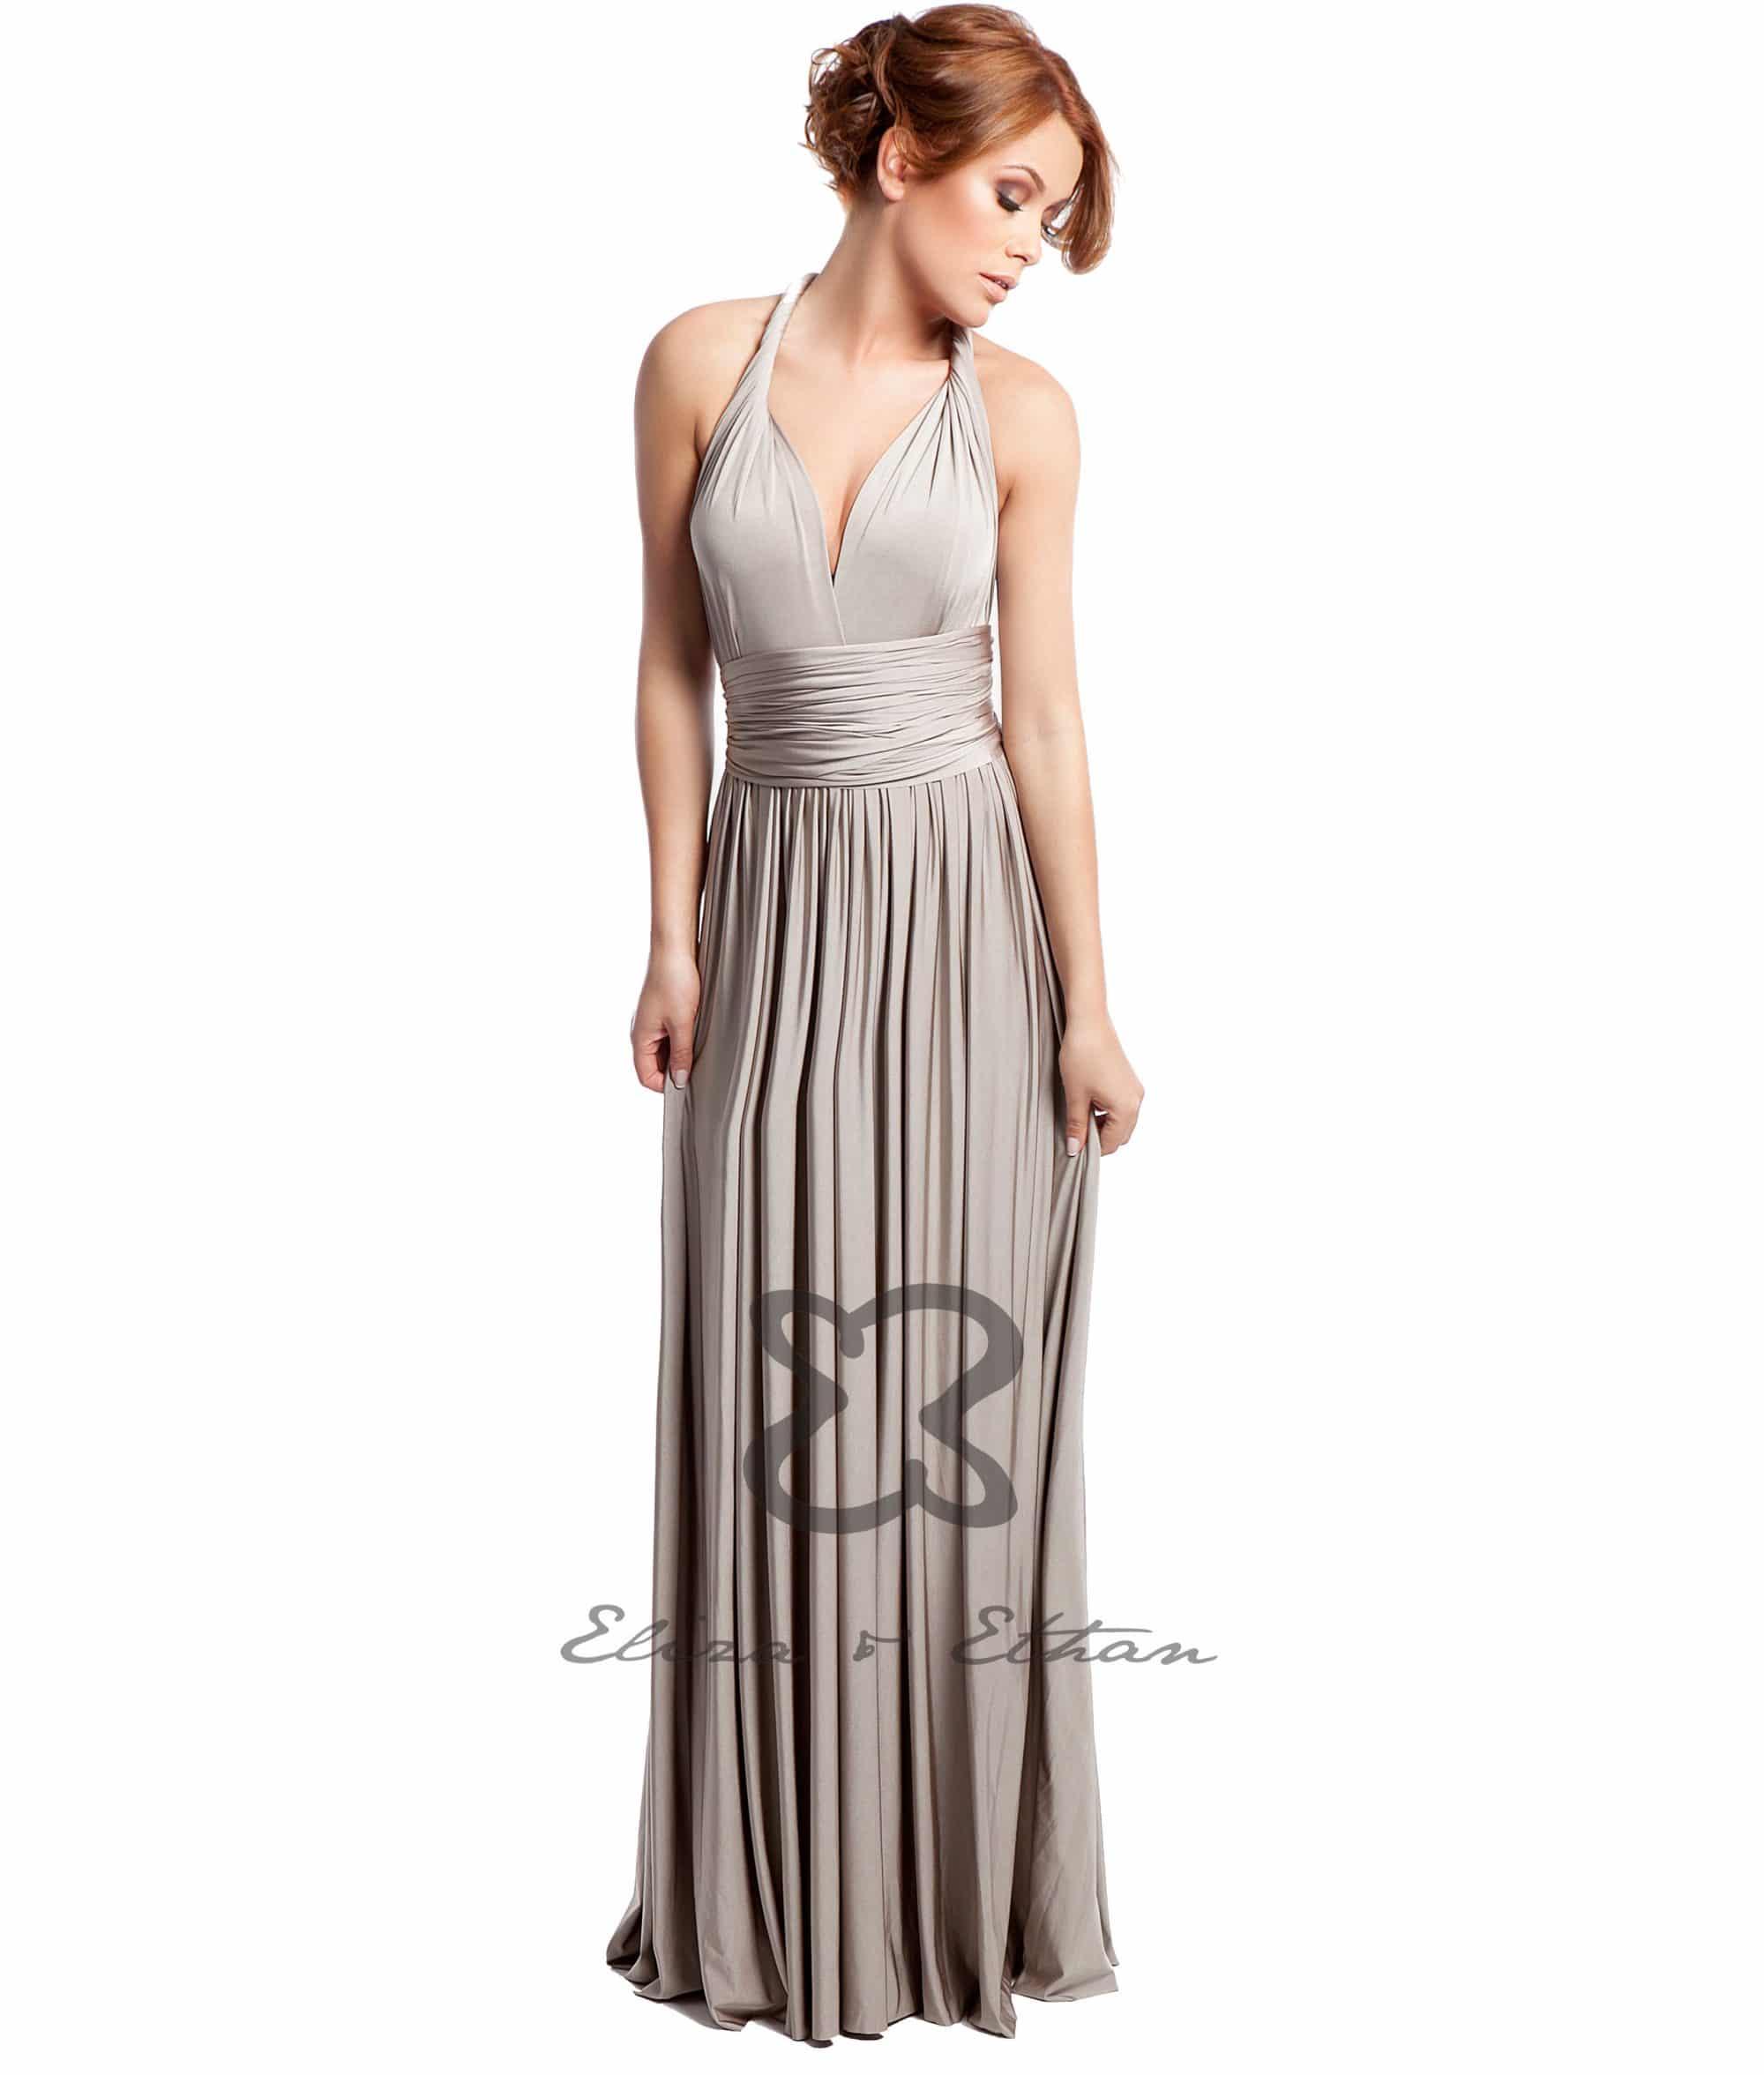 Champagne Eliza U0026 Ethan Multi-wrap Dress - Alila